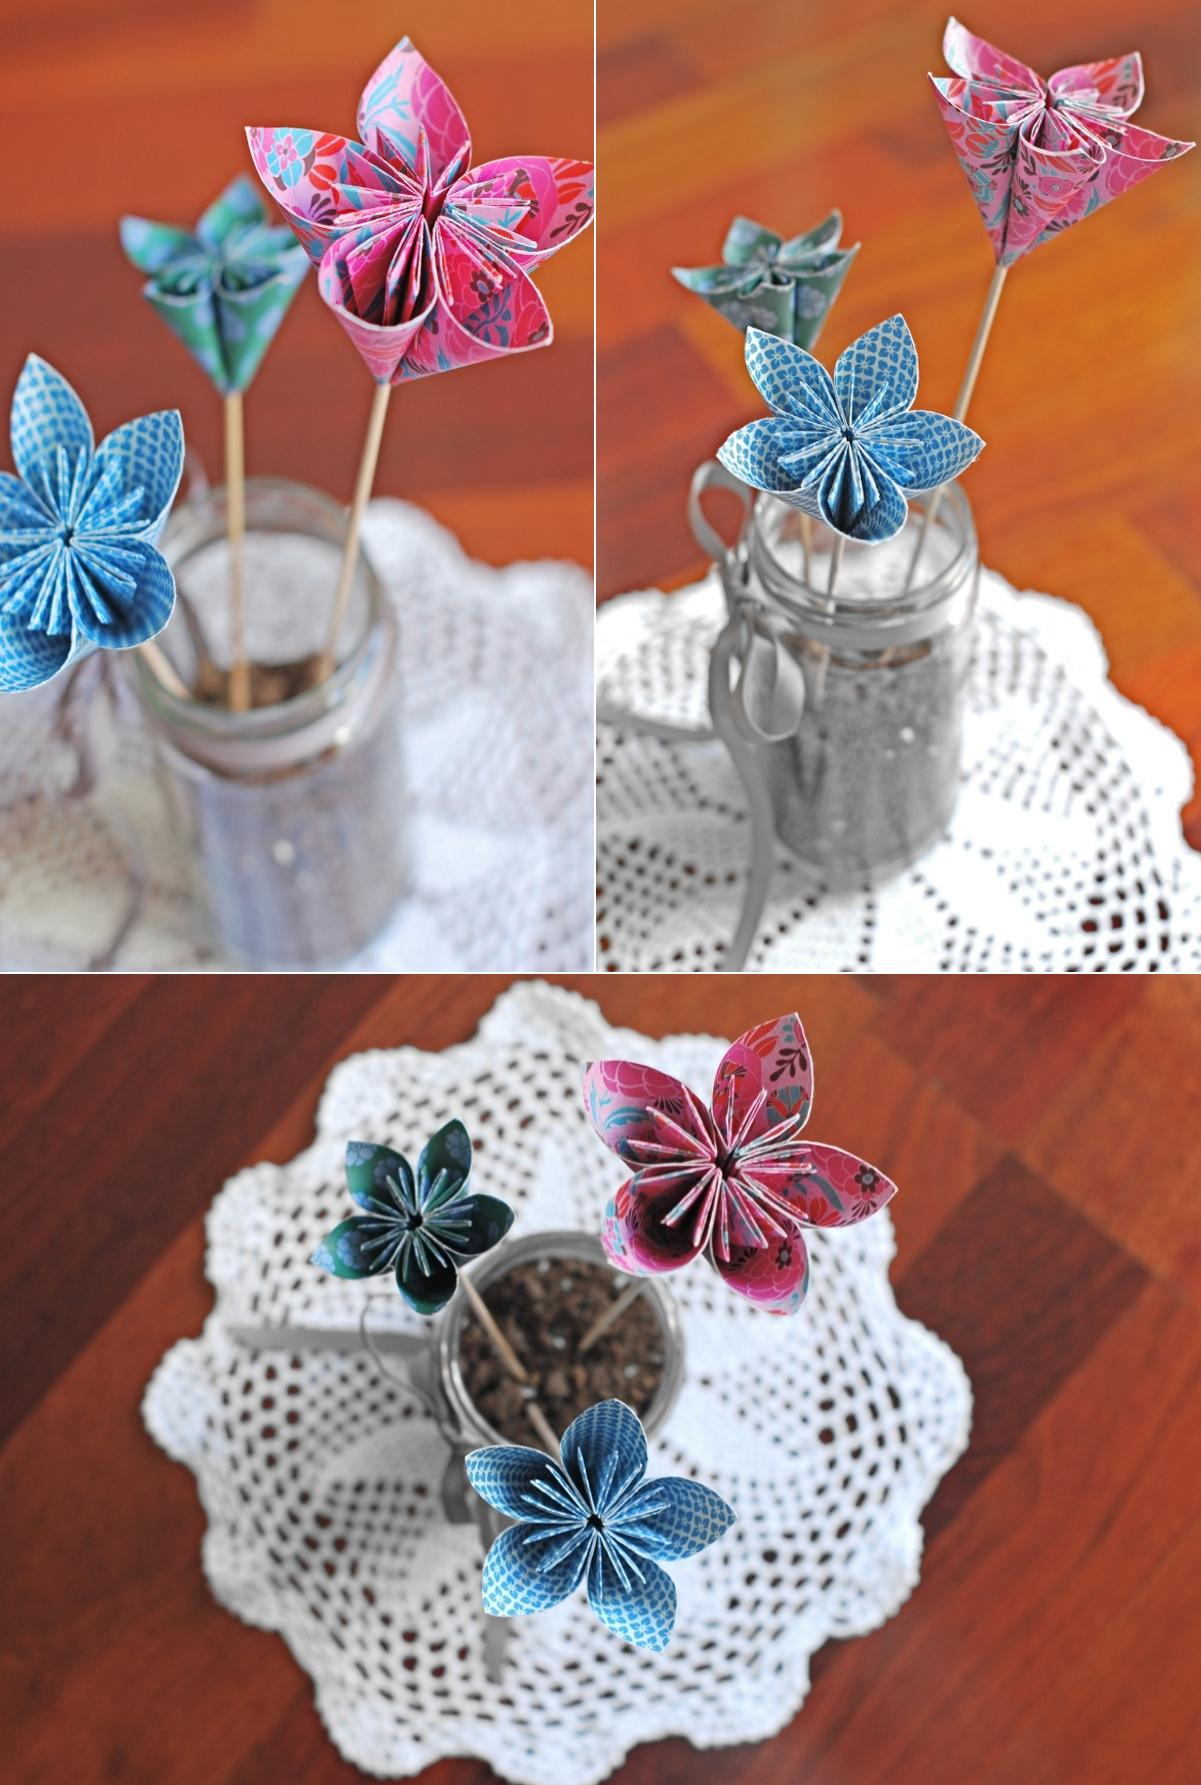 Origami Decoracion De Mesa ~ Centros de mesa con flores de papel Paper flowers centerpieces